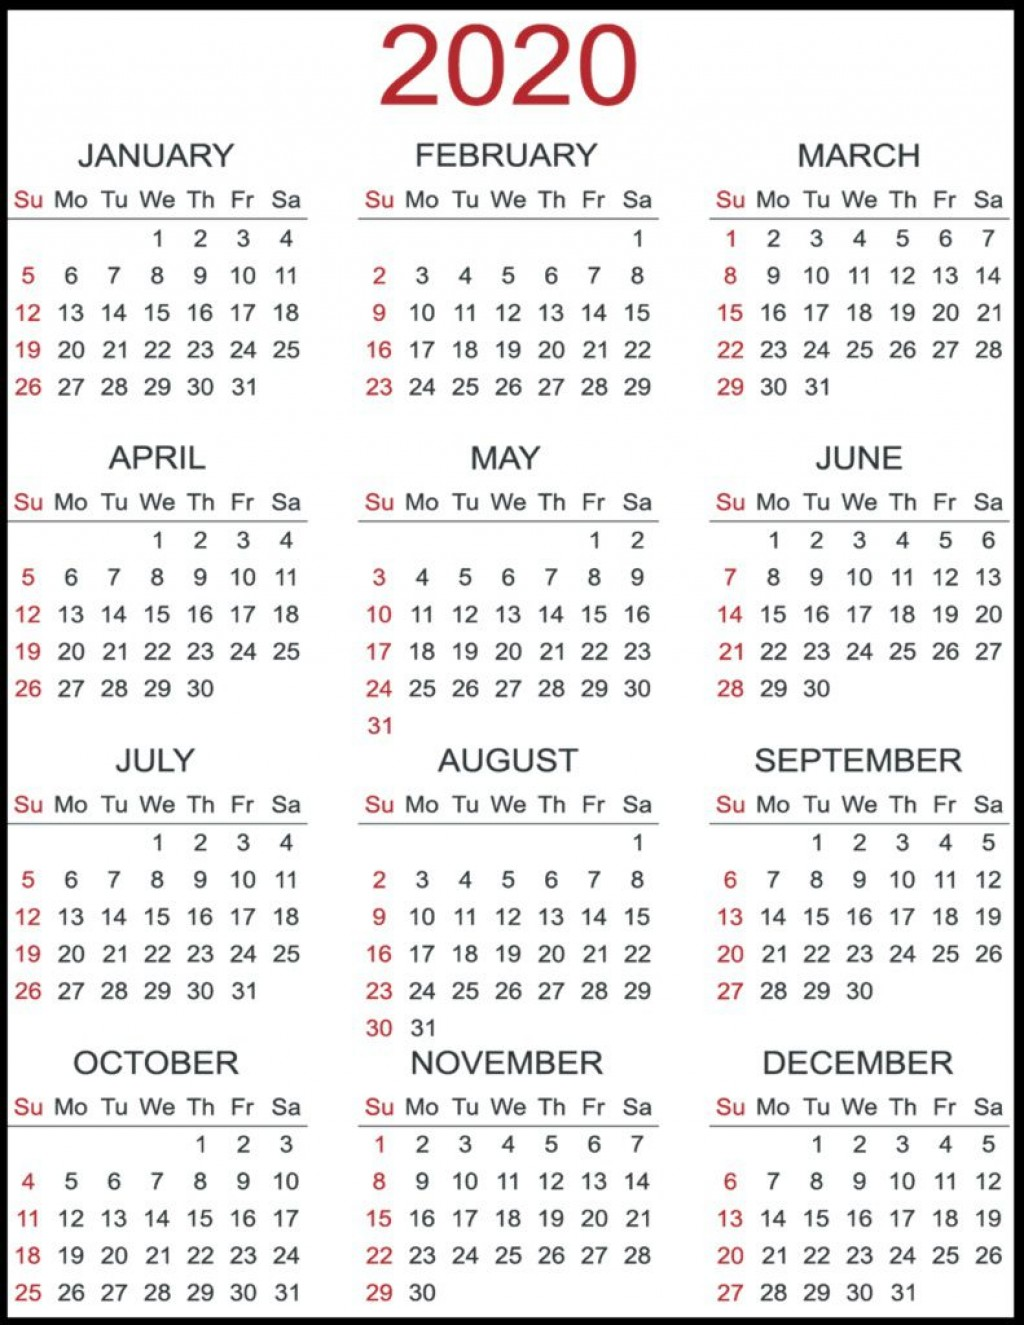 007 Phenomenal 2020 Payroll Calendar Template High Resolution  Biweekly Canada Free ExcelLarge